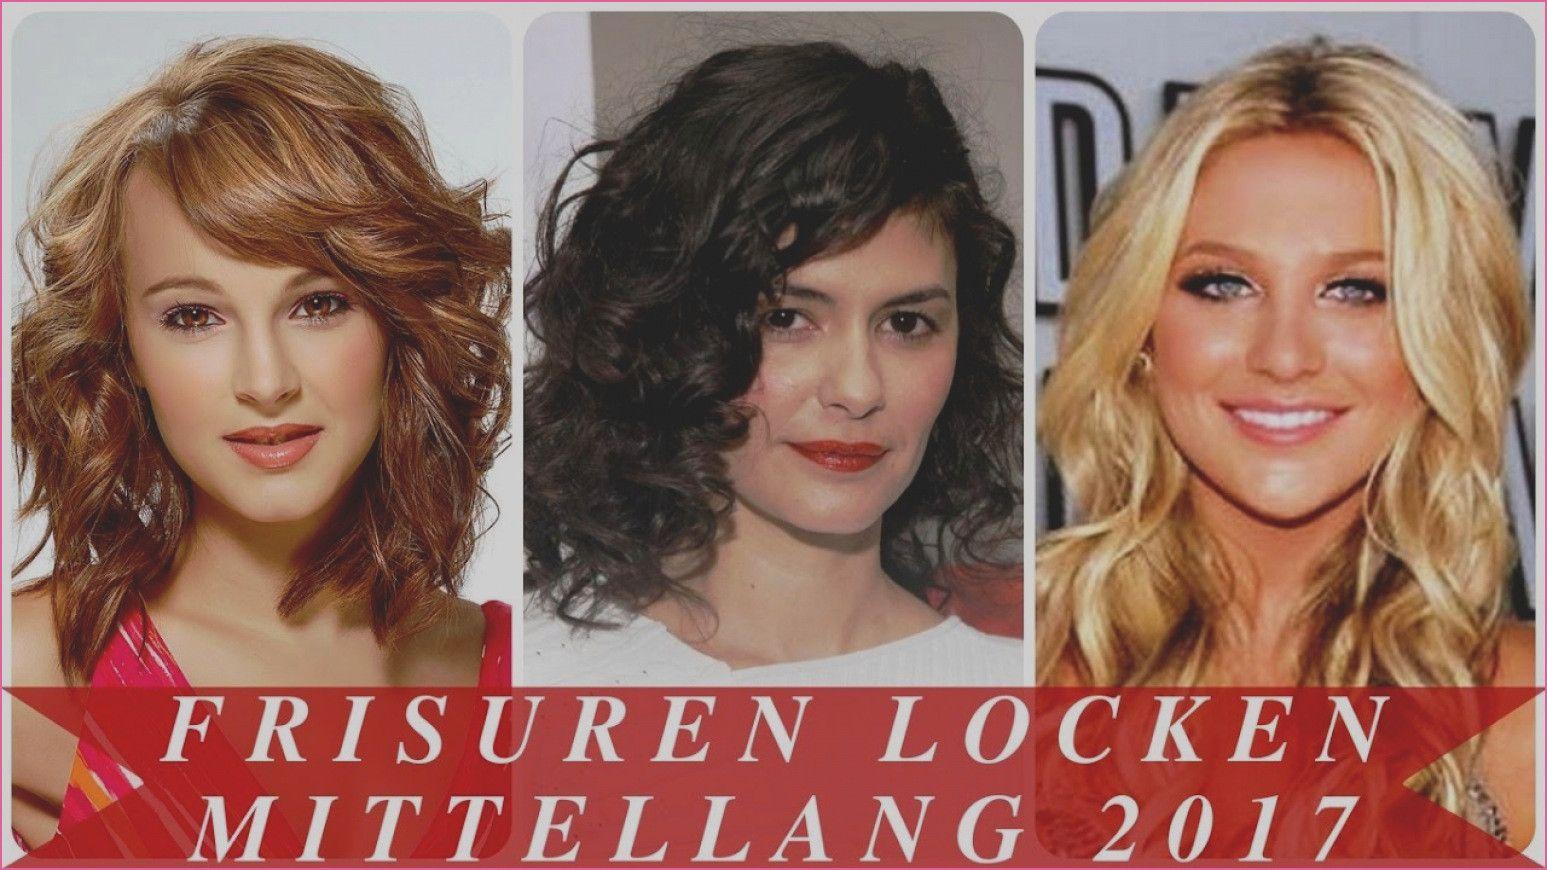 Nett Frisur Locken Schulterlang In 2020 Frisuren Mit Locken Mittellang Locken Machen Locken Frisuren